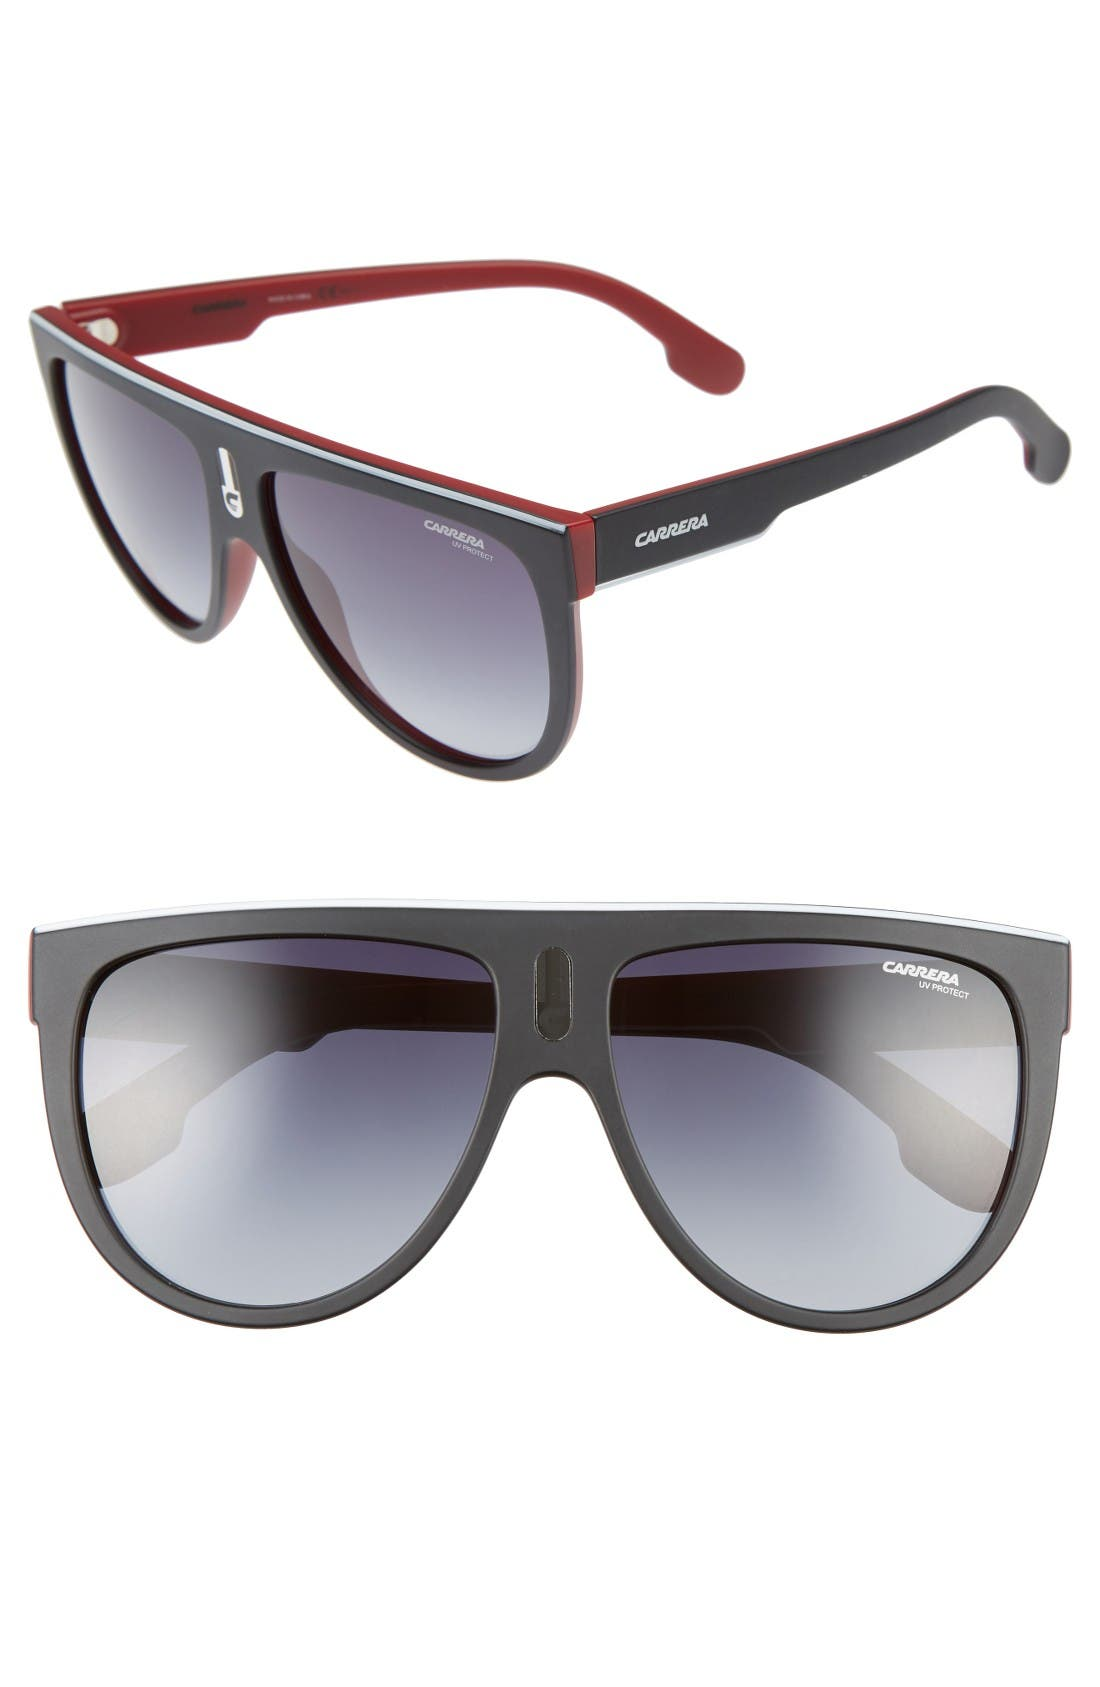 Alternate Image 1 Selected - Carrera Eyewear 1000/S 60mm Sunglasses